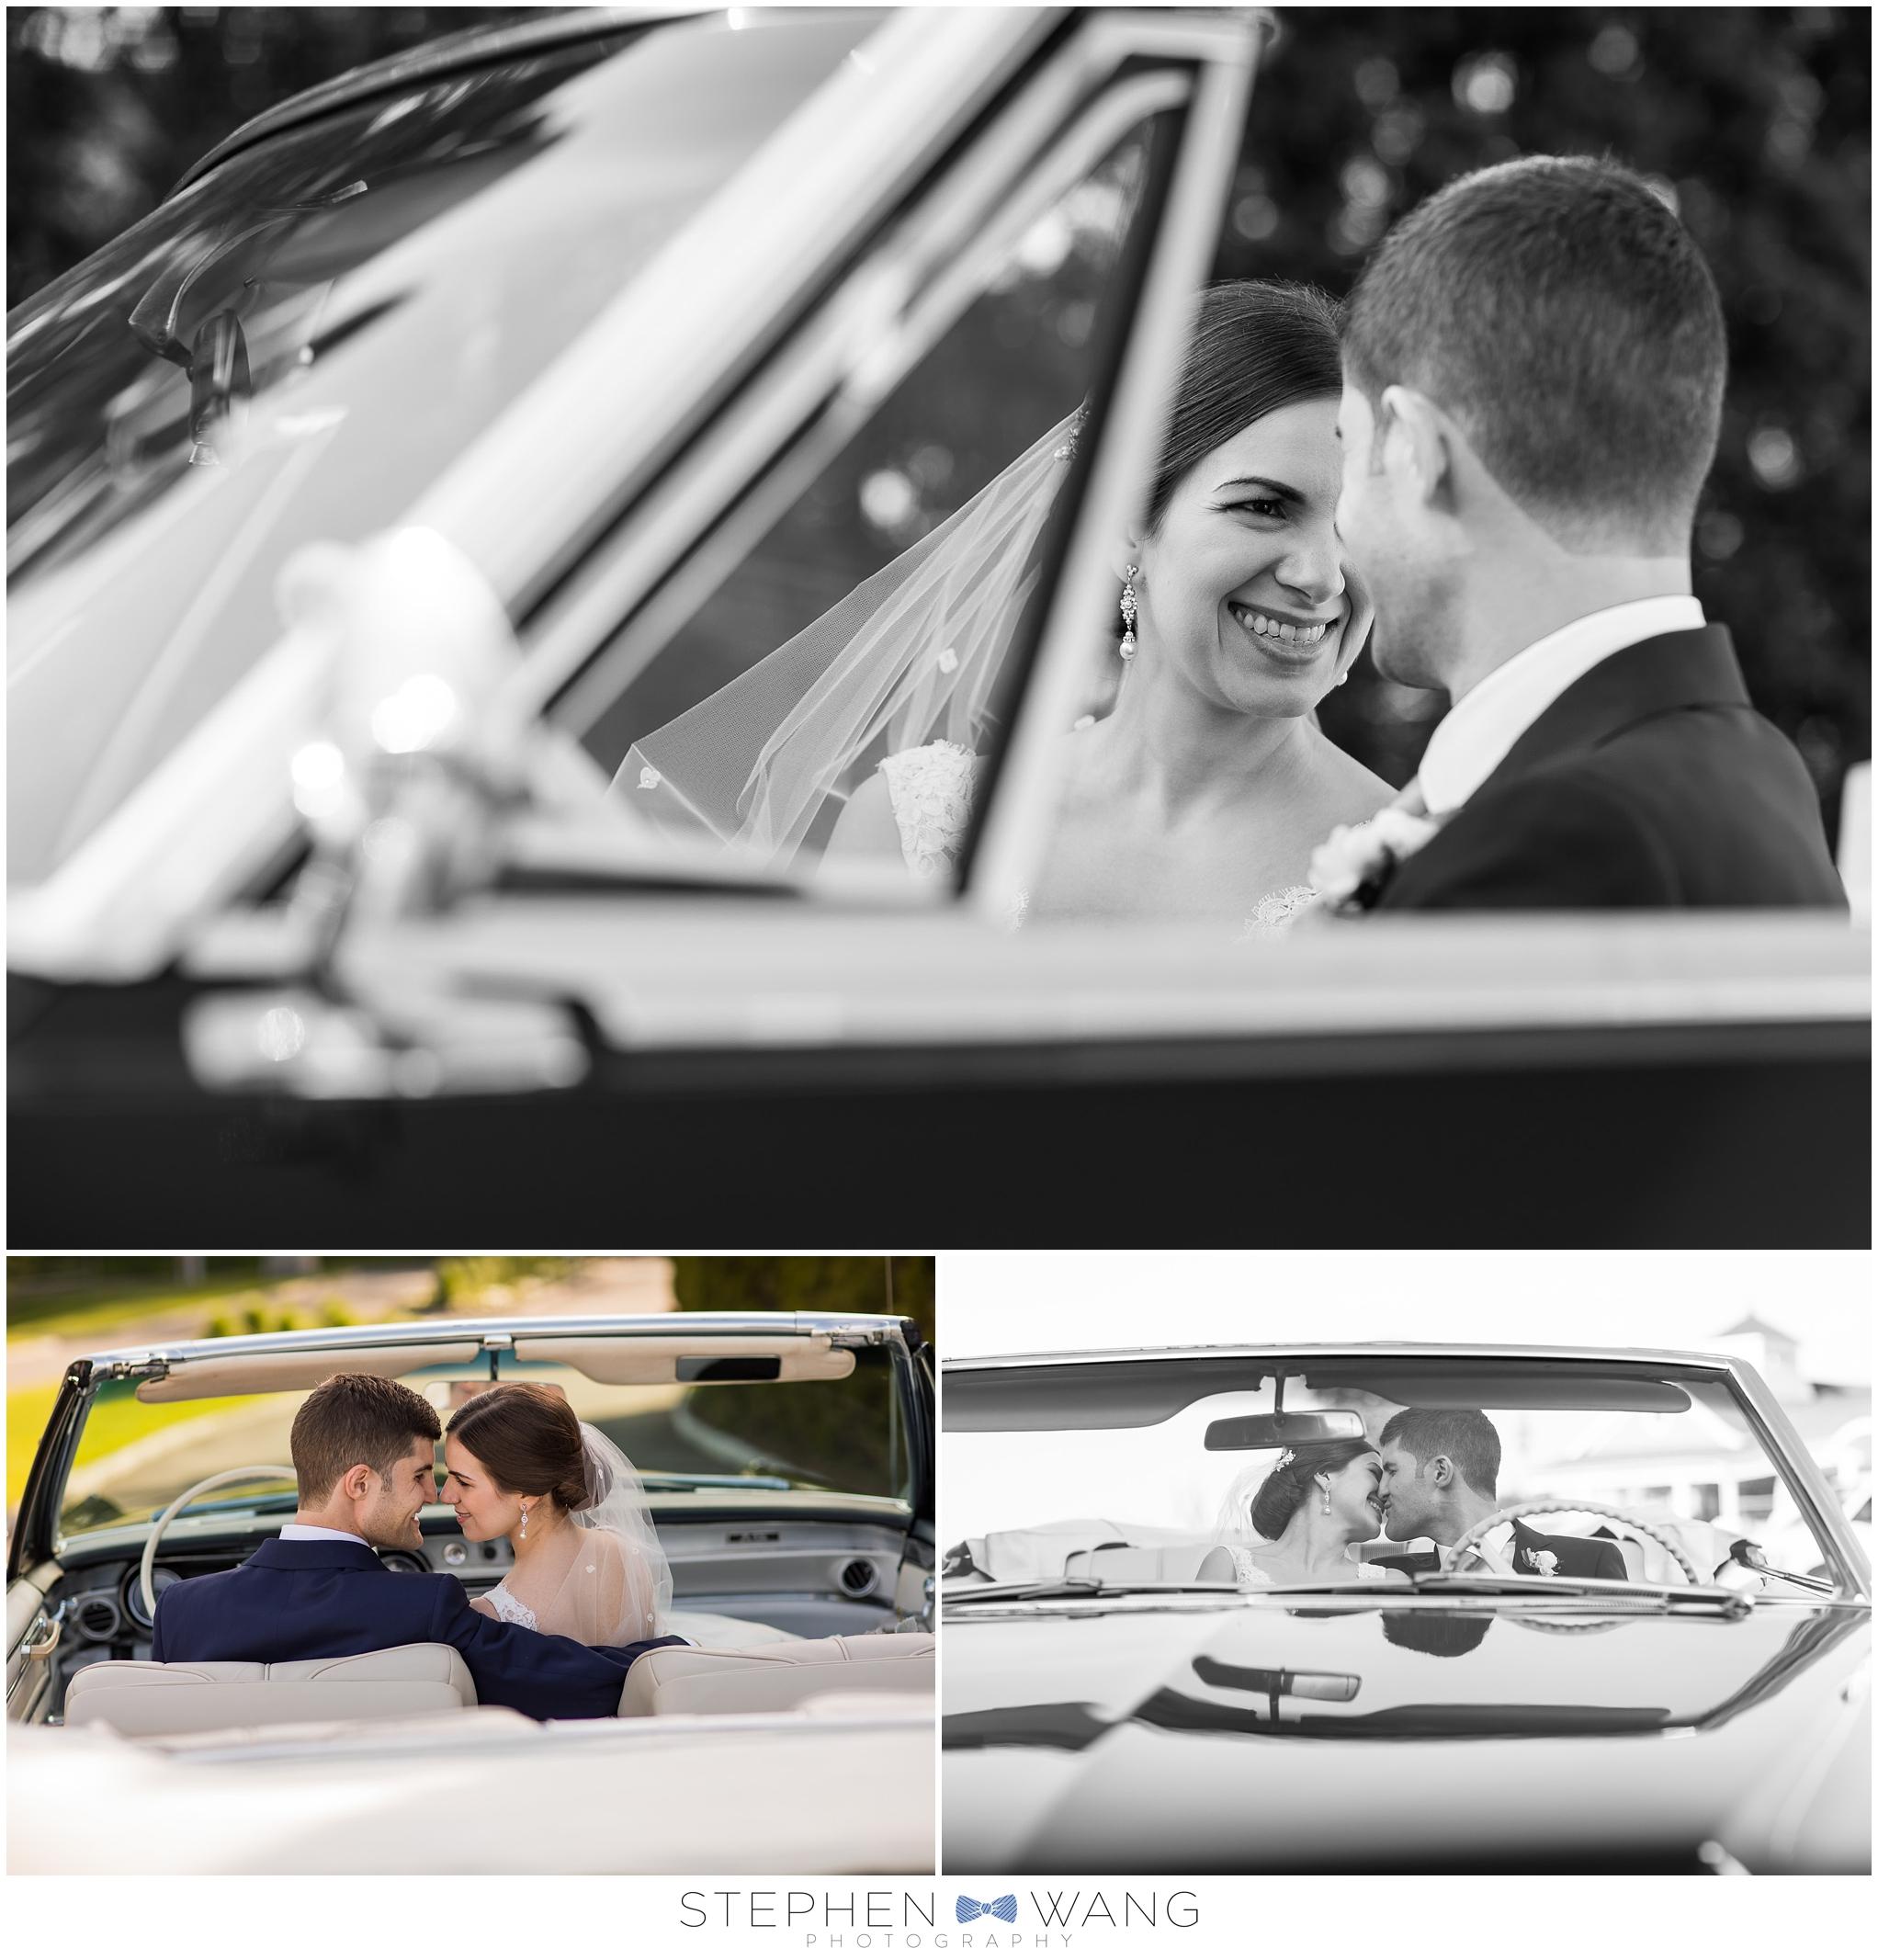 Stephen Wang Photography Shorehaven Norwalk CT Wedding Photographer connecticut shoreline shore haven - 24.jpg